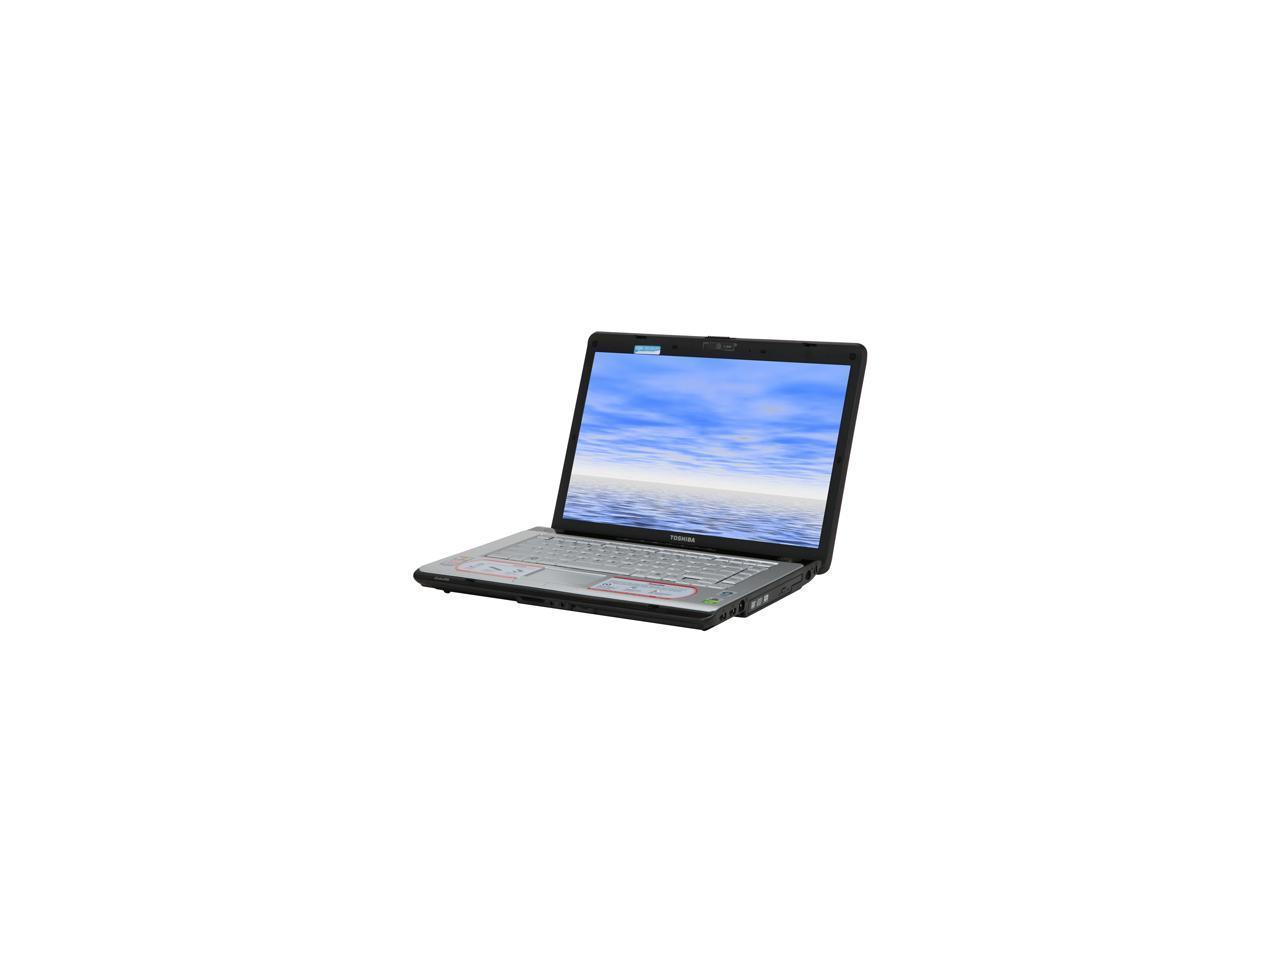 Toshiba Satellite a215-s4757 Notebook Netzteil Auto/LKW Computer ...